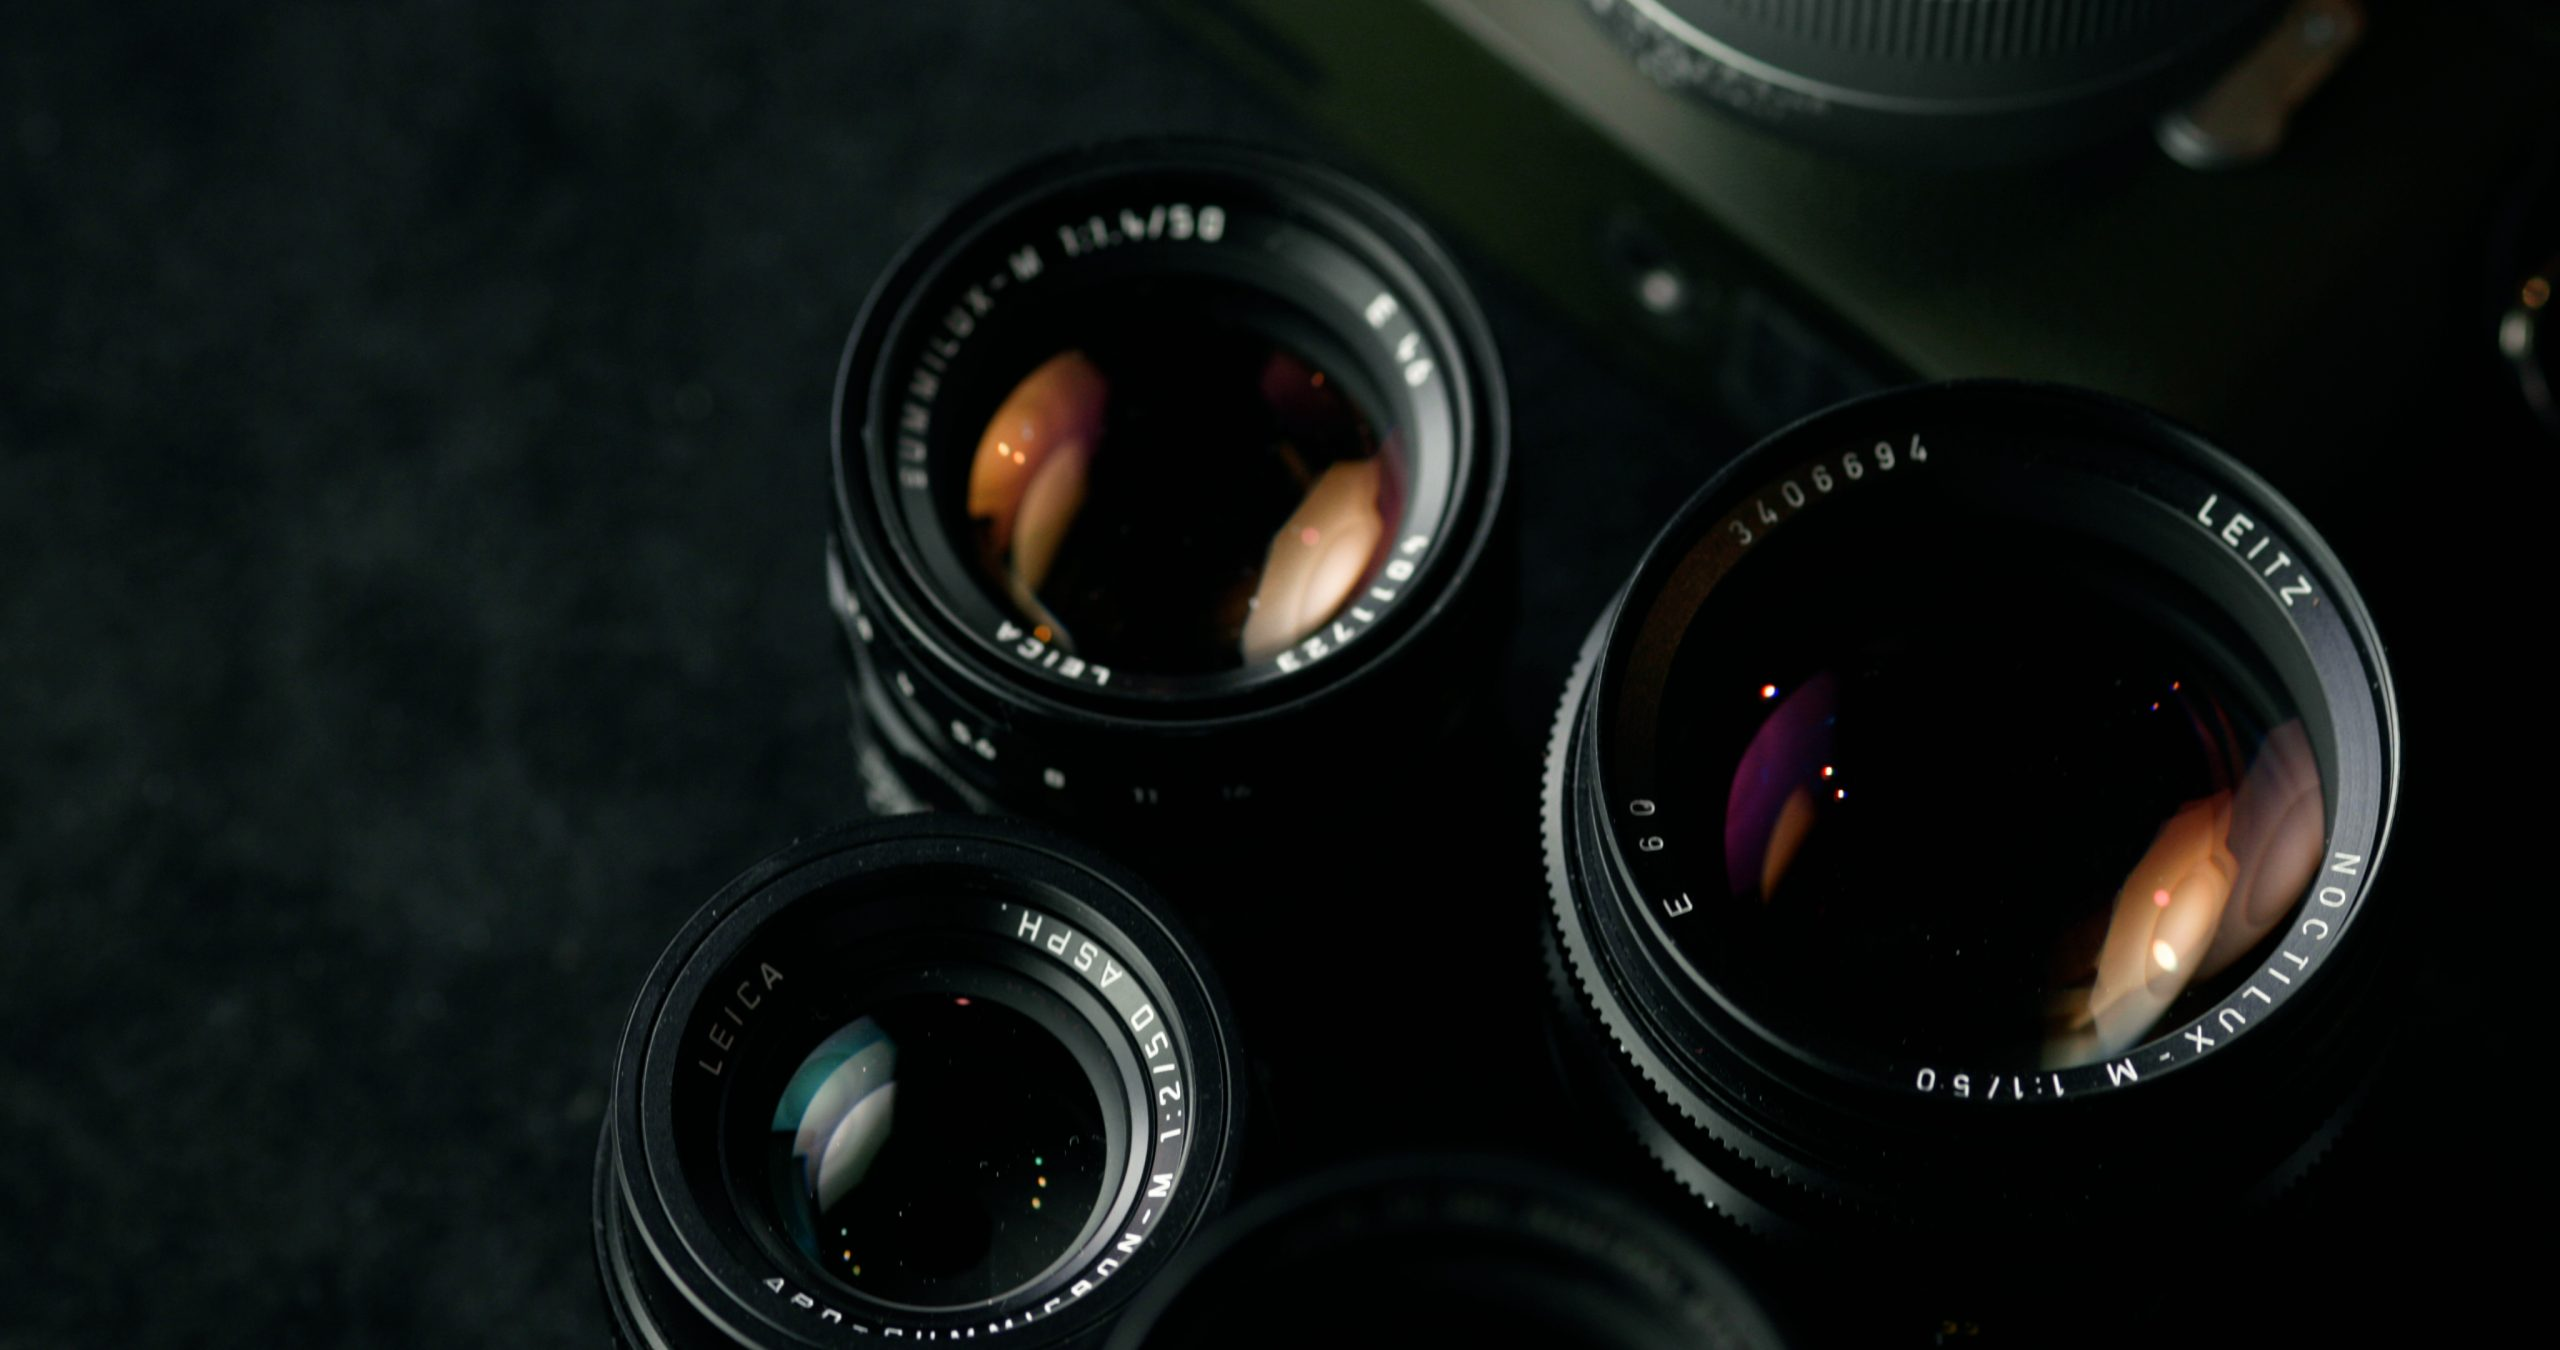 Leica Noctilux-M 50mm f/1.0 ASPH Lens Photography, Master Photographer Oz Yilmaz explains how to capture better photographs with Leica Noctilux-M 50mm lens.